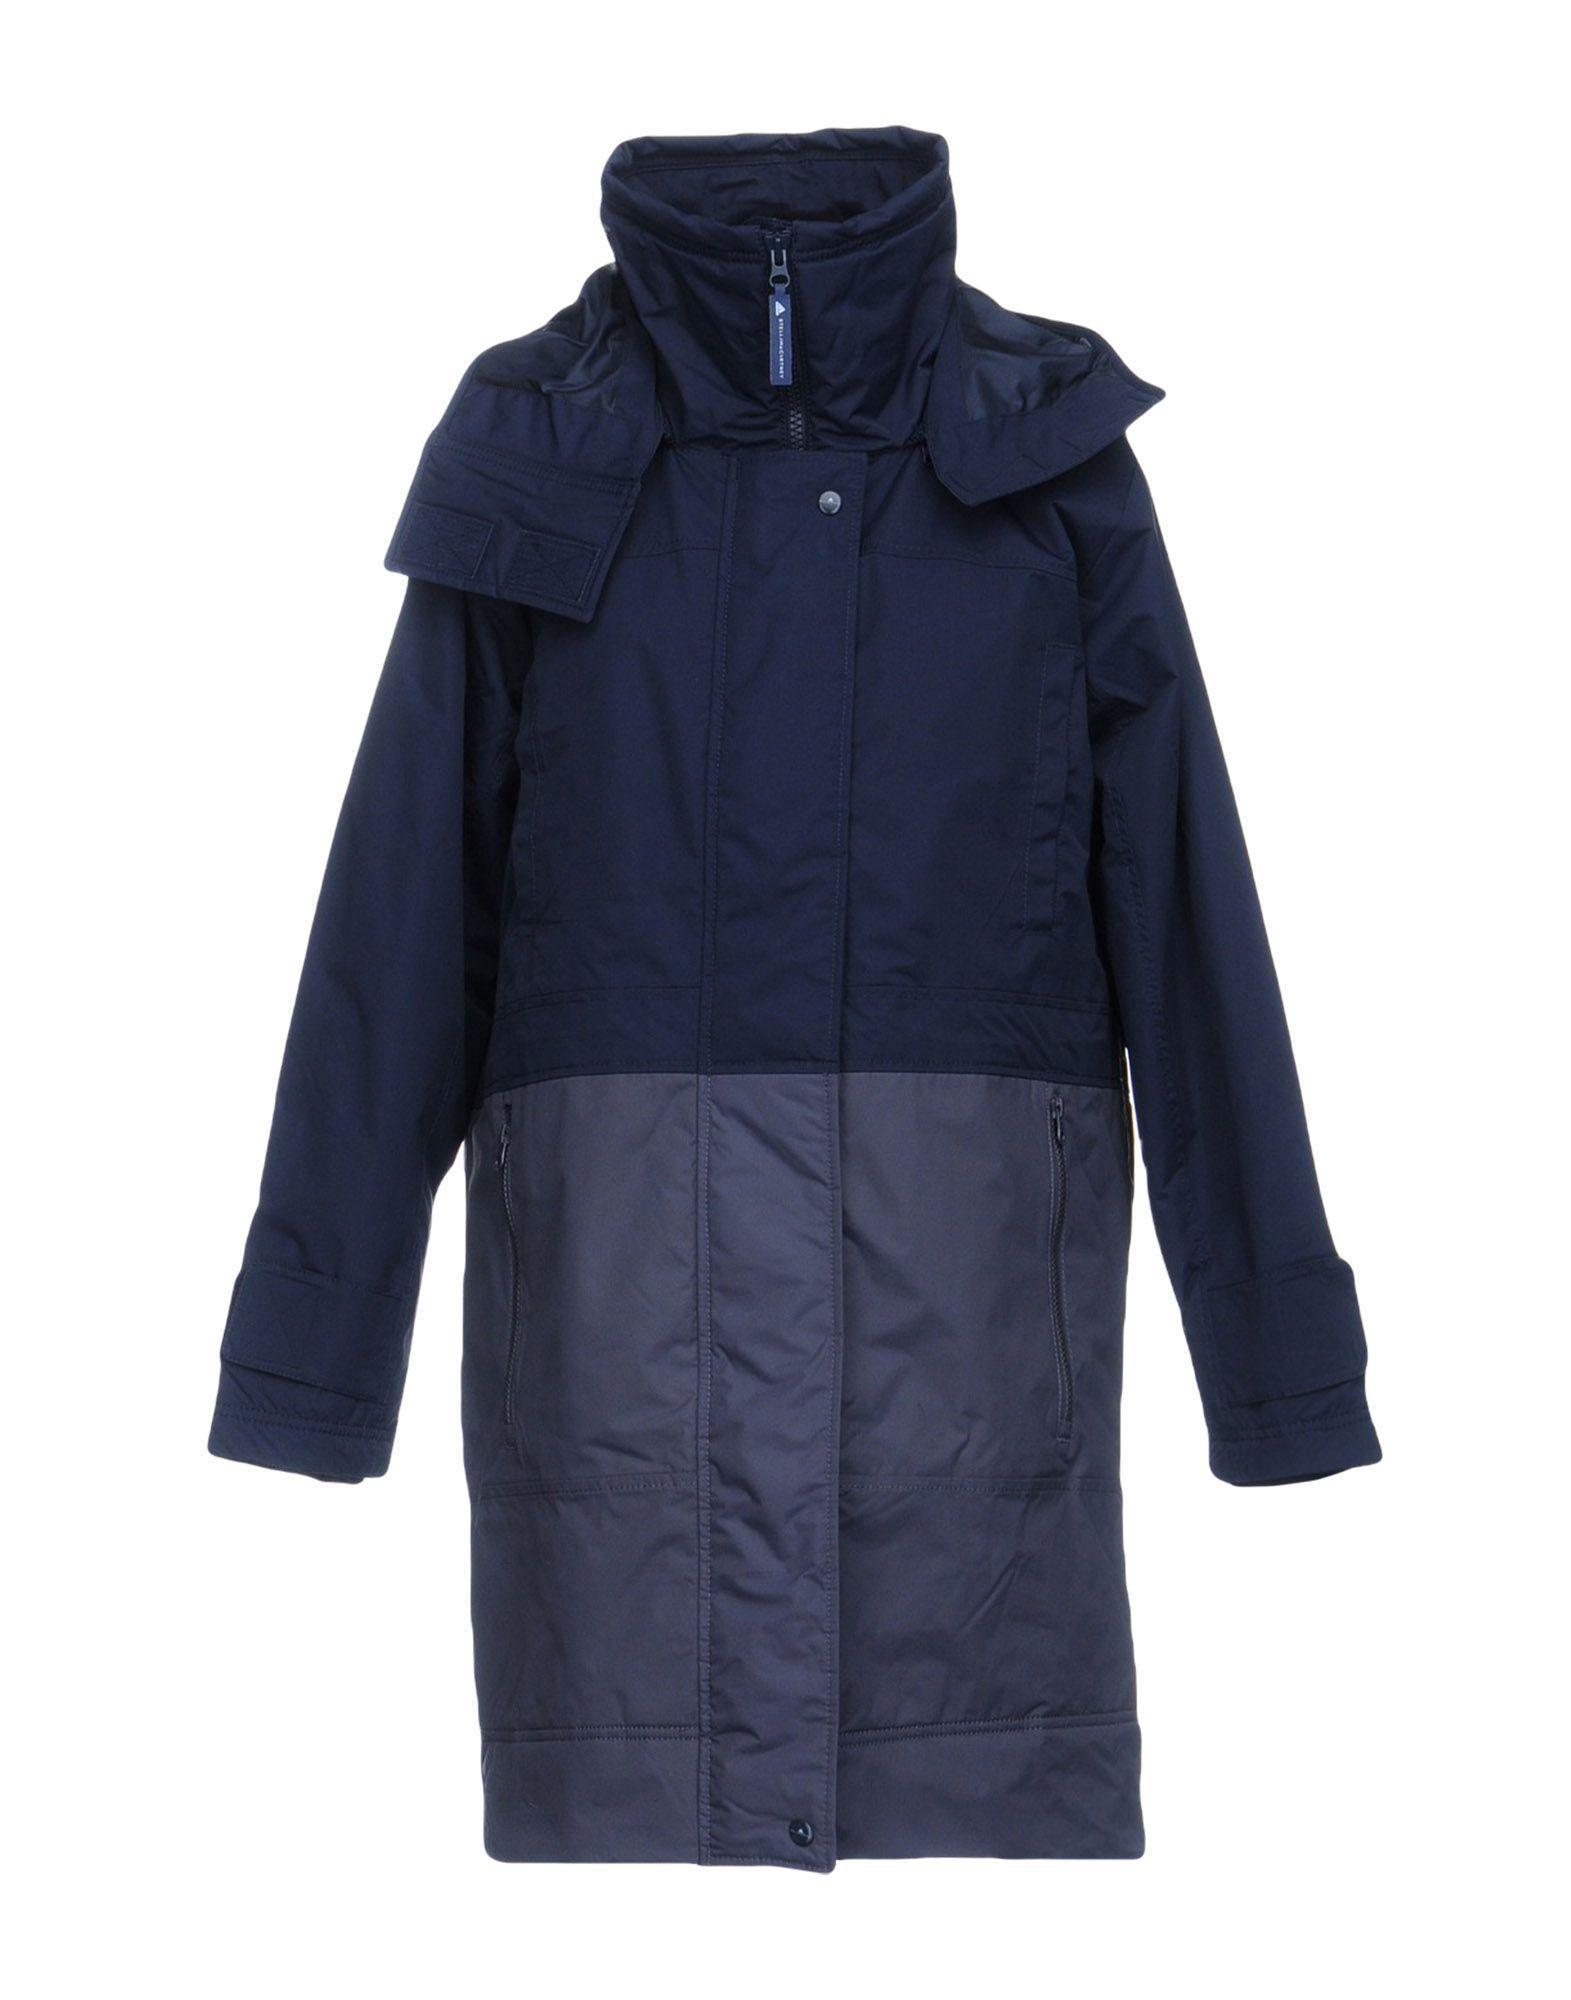 Adidas By Stella Mccartney Synthetic Padding In Dark Blue